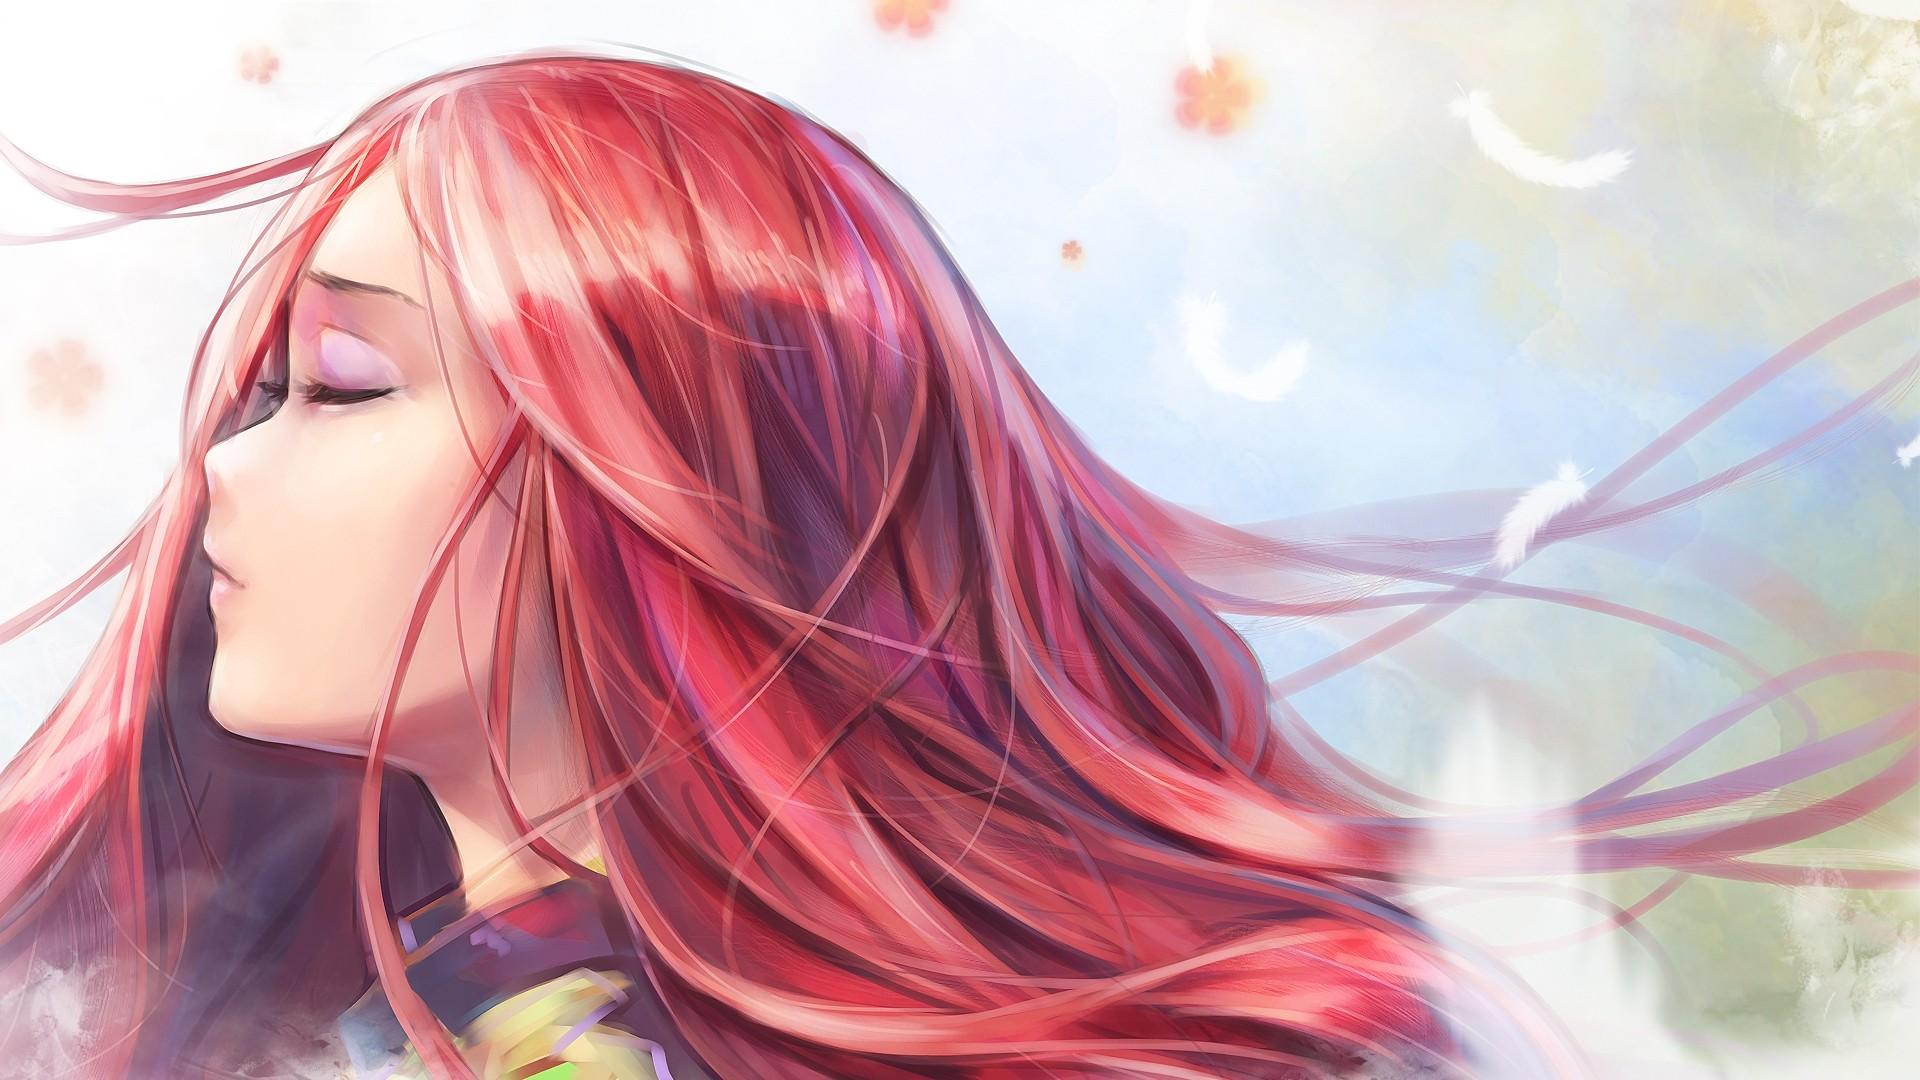 Red Hair Anime Girl High Quality